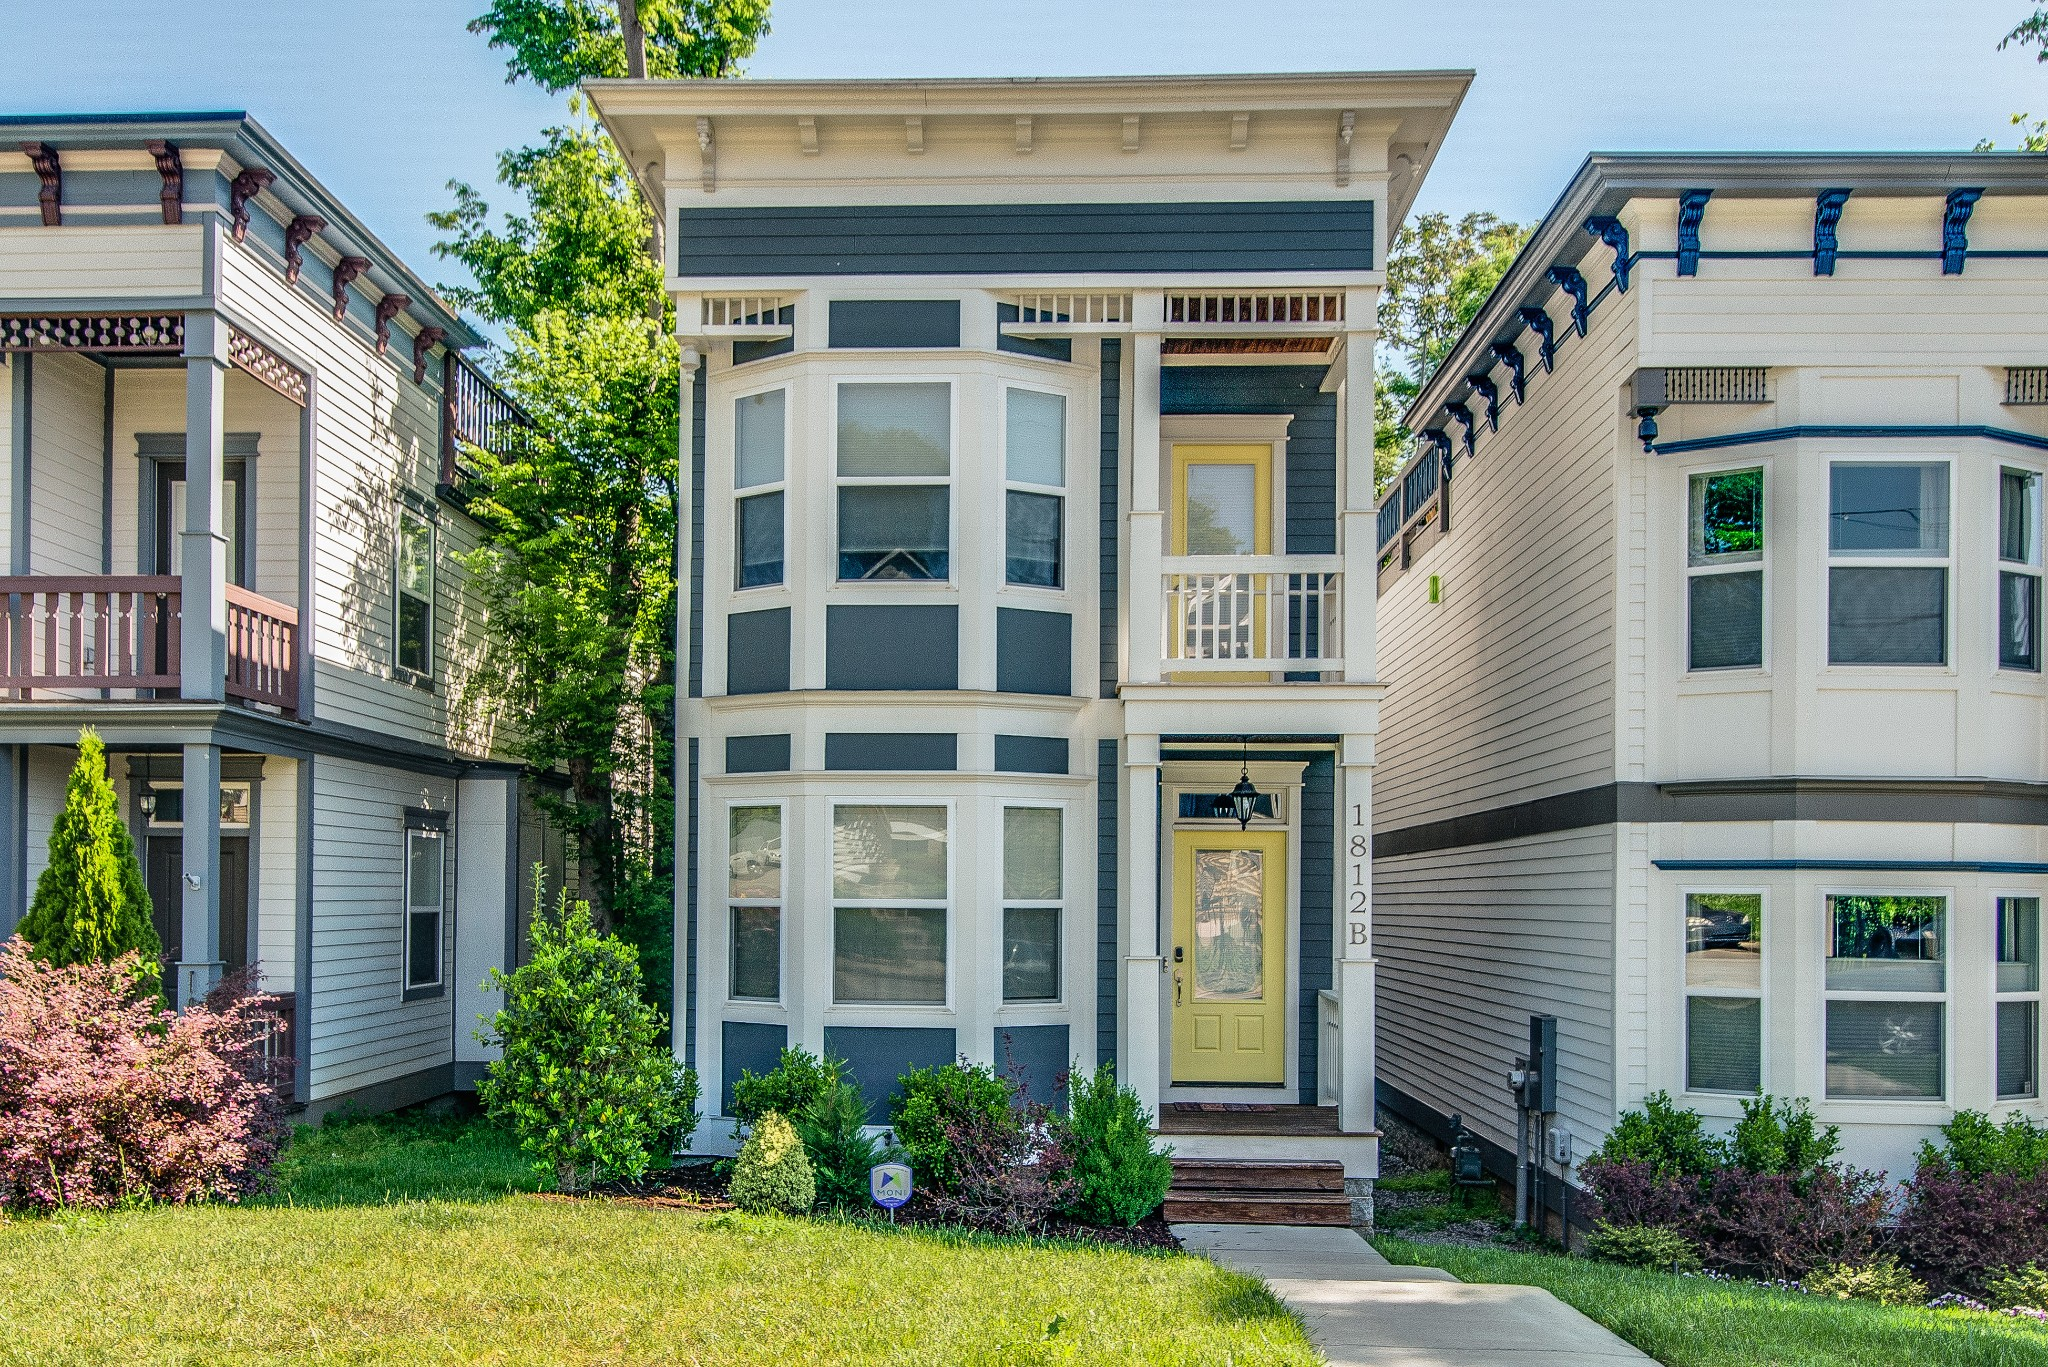 1812B 6th Ave, N, Nashville, TN 37208 - Nashville, TN real estate listing